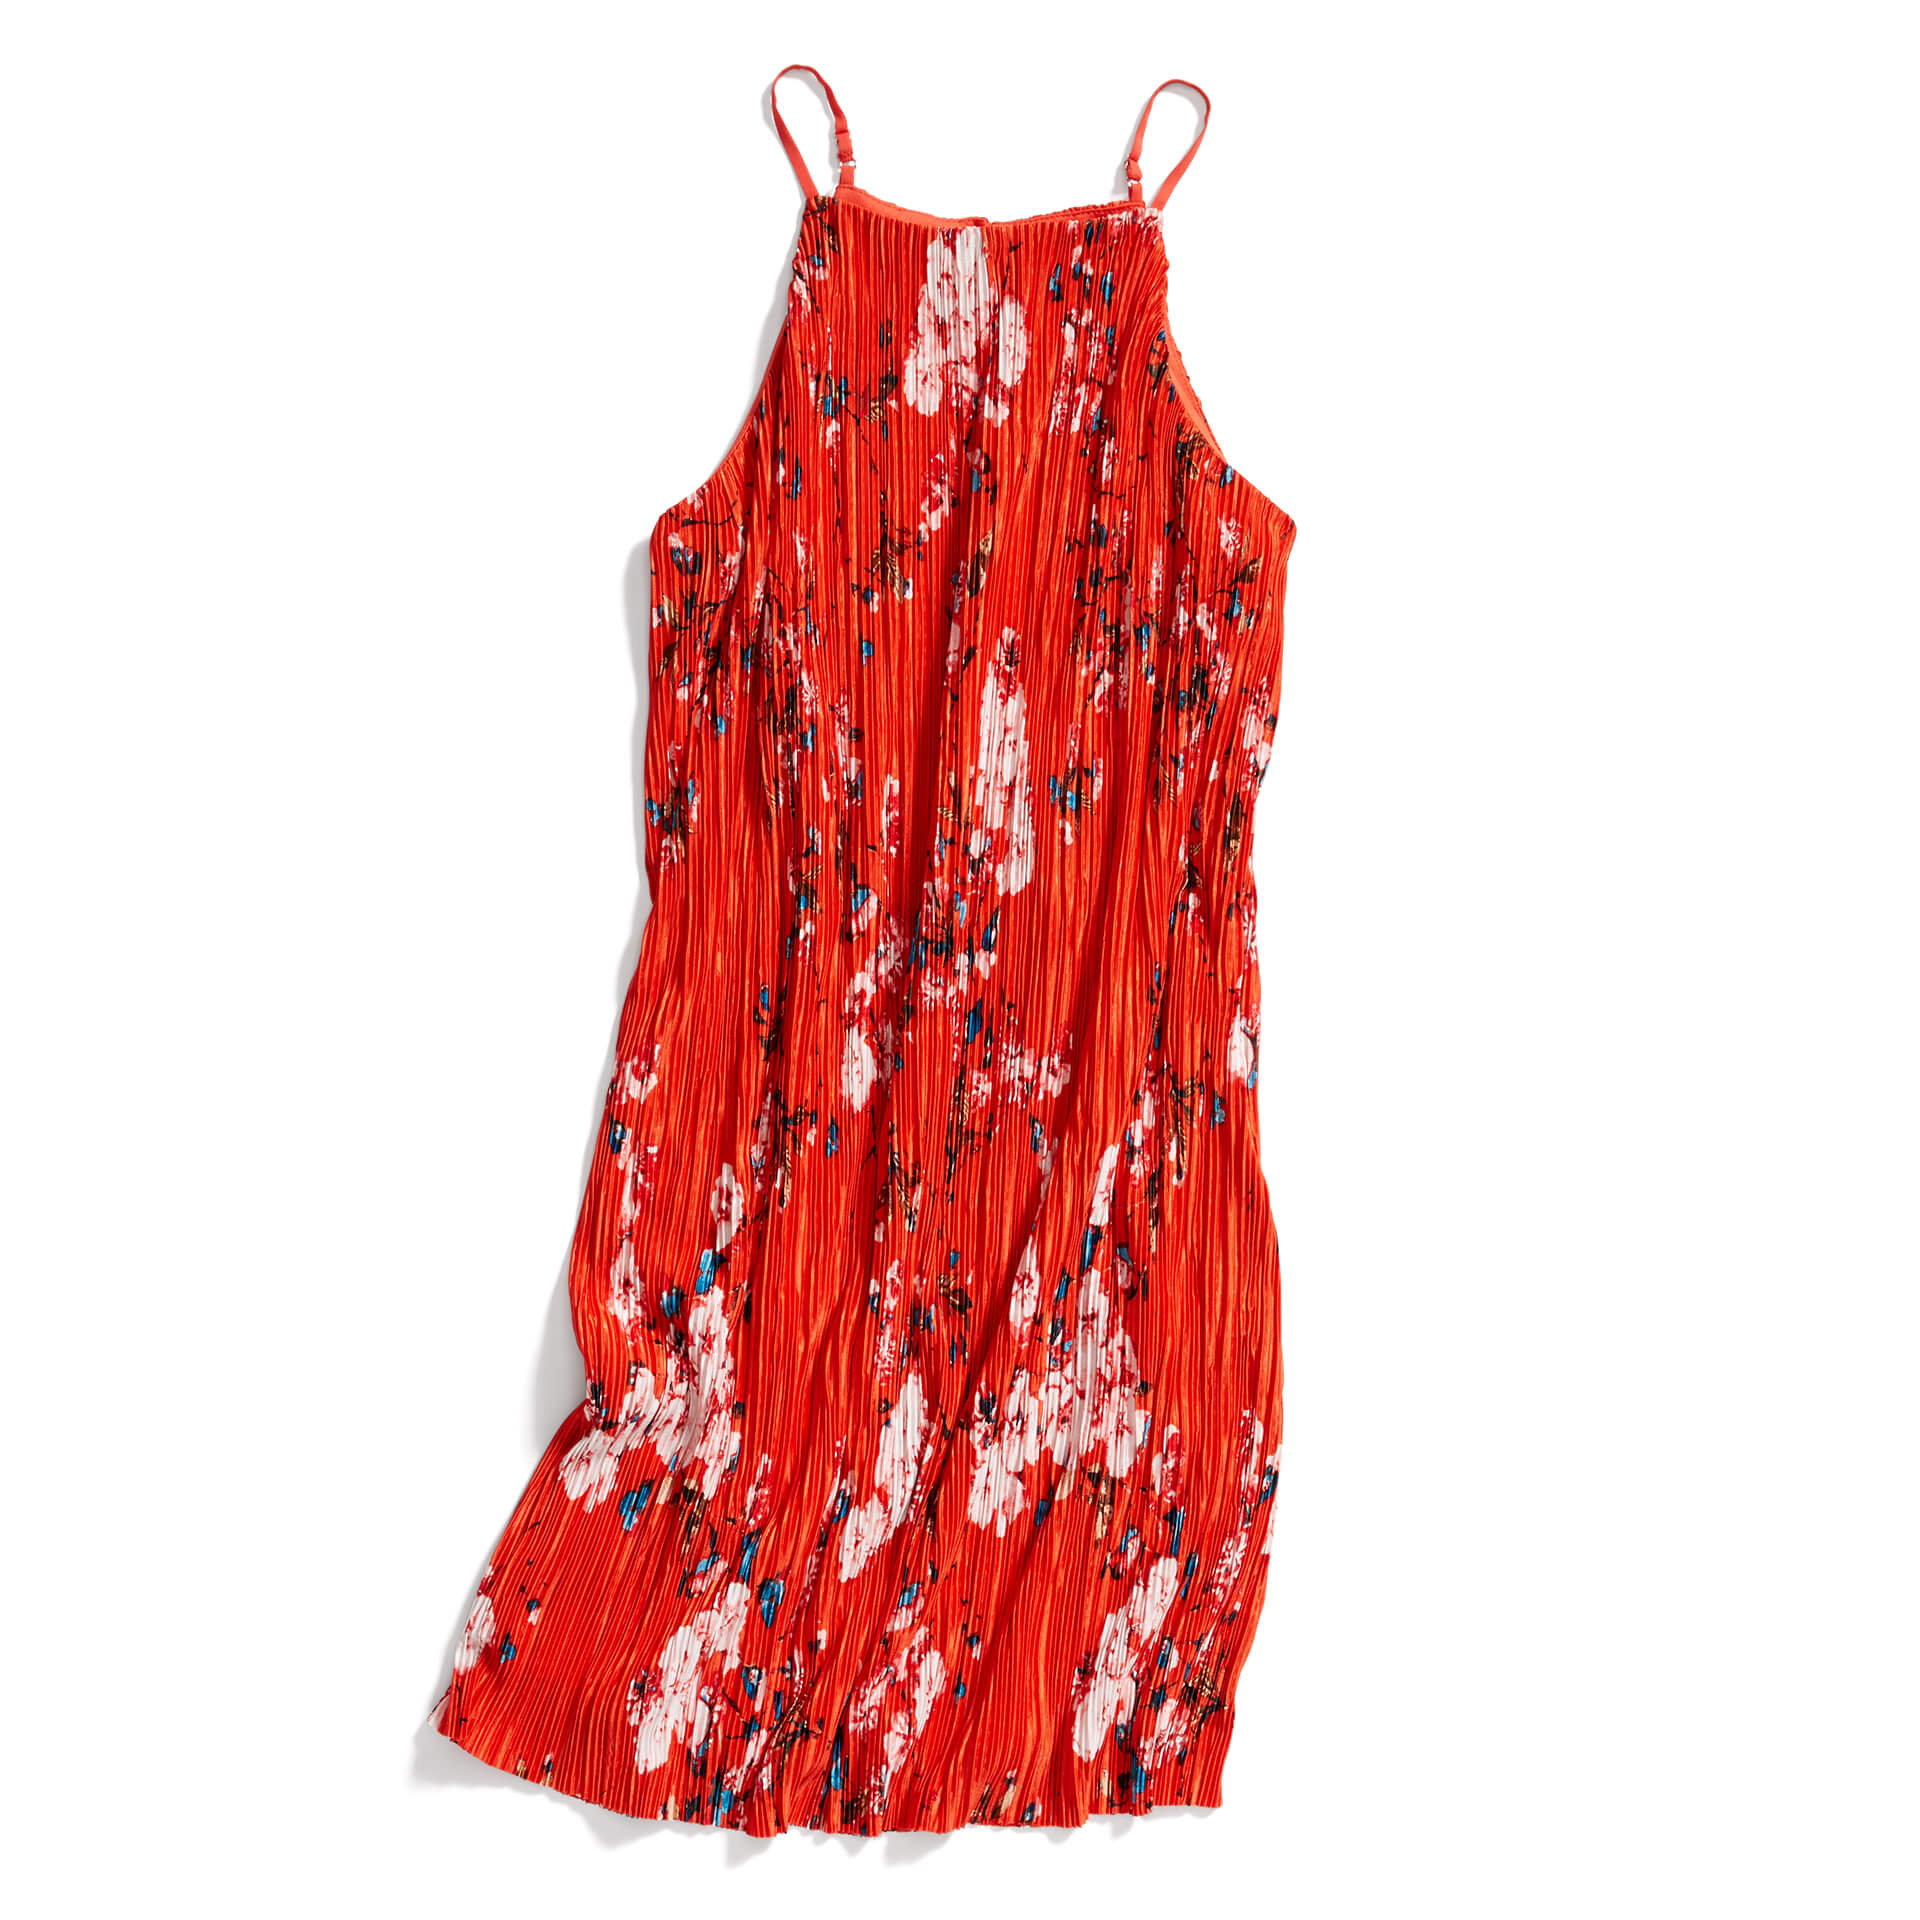 Stitch Fix Sundresses for Summer